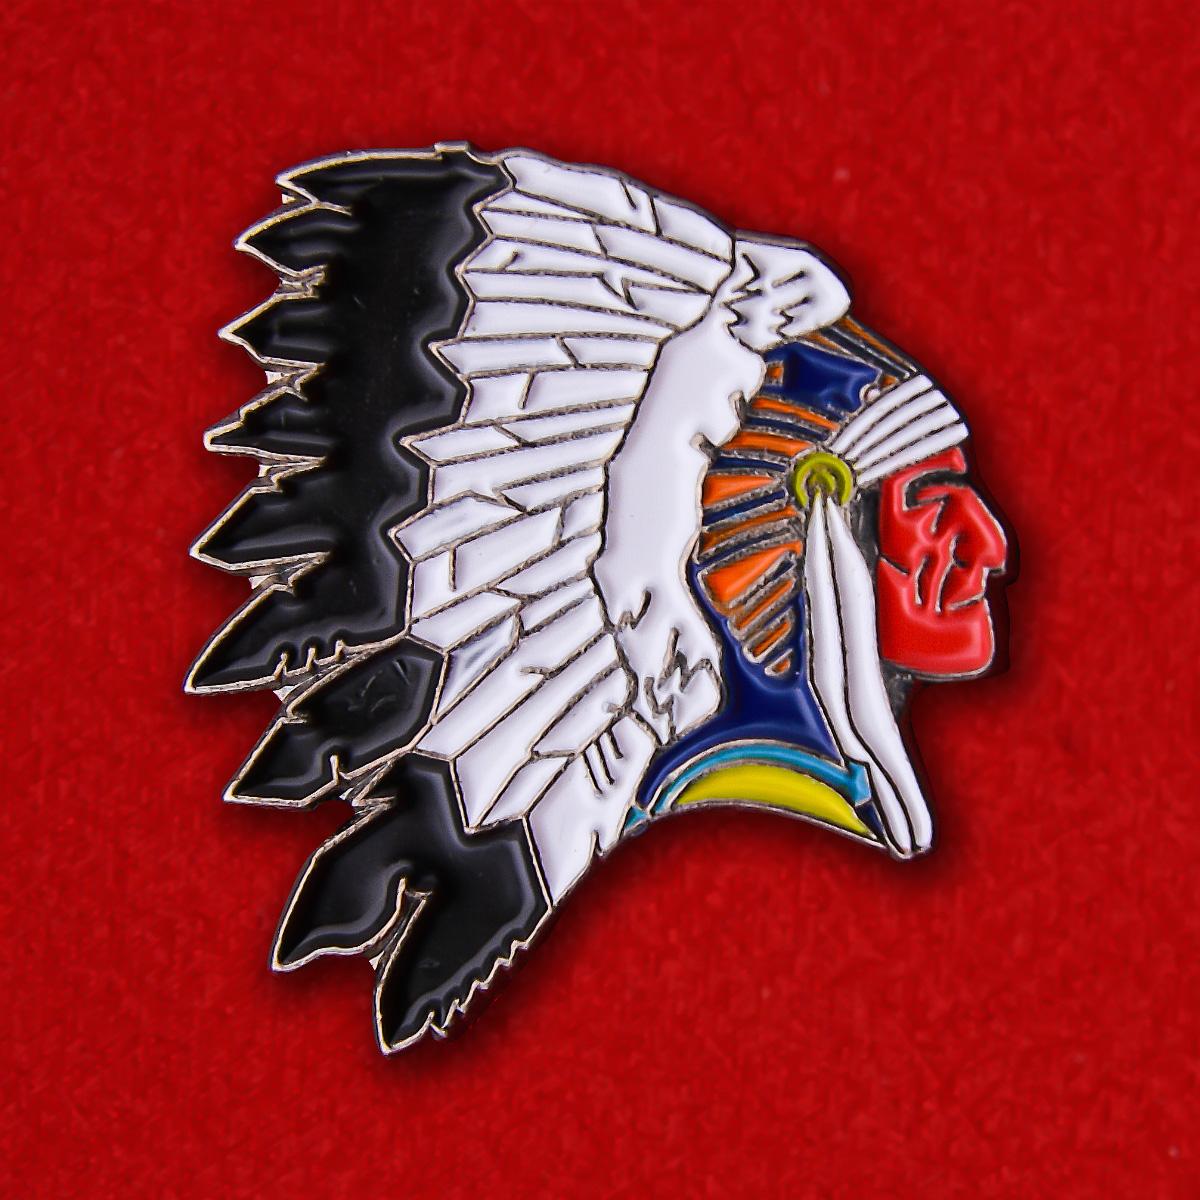 Металлические значки на заказ в Москве